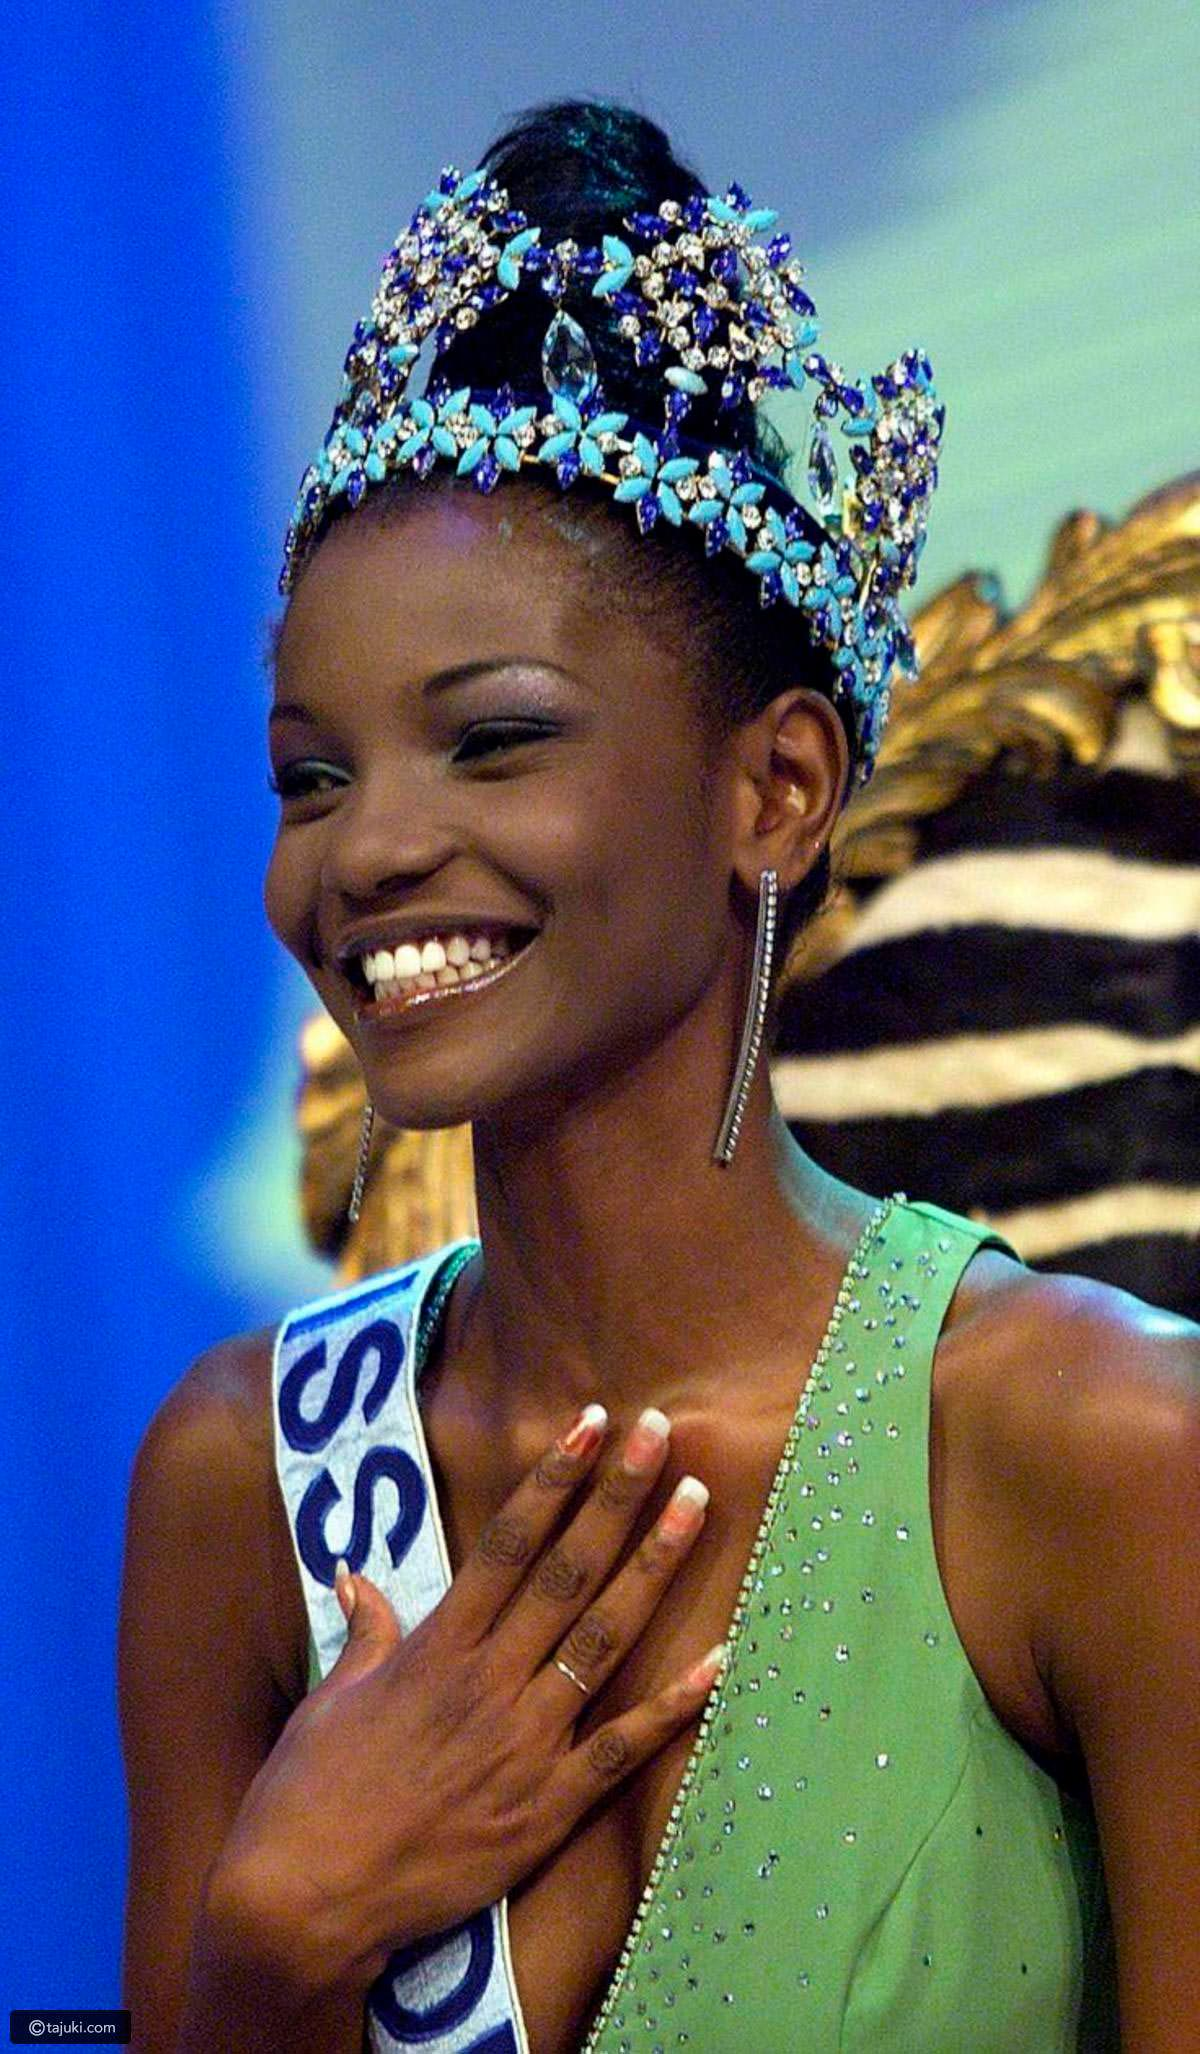 Фото | Мисс Мира 2001 года Агбани Дарего